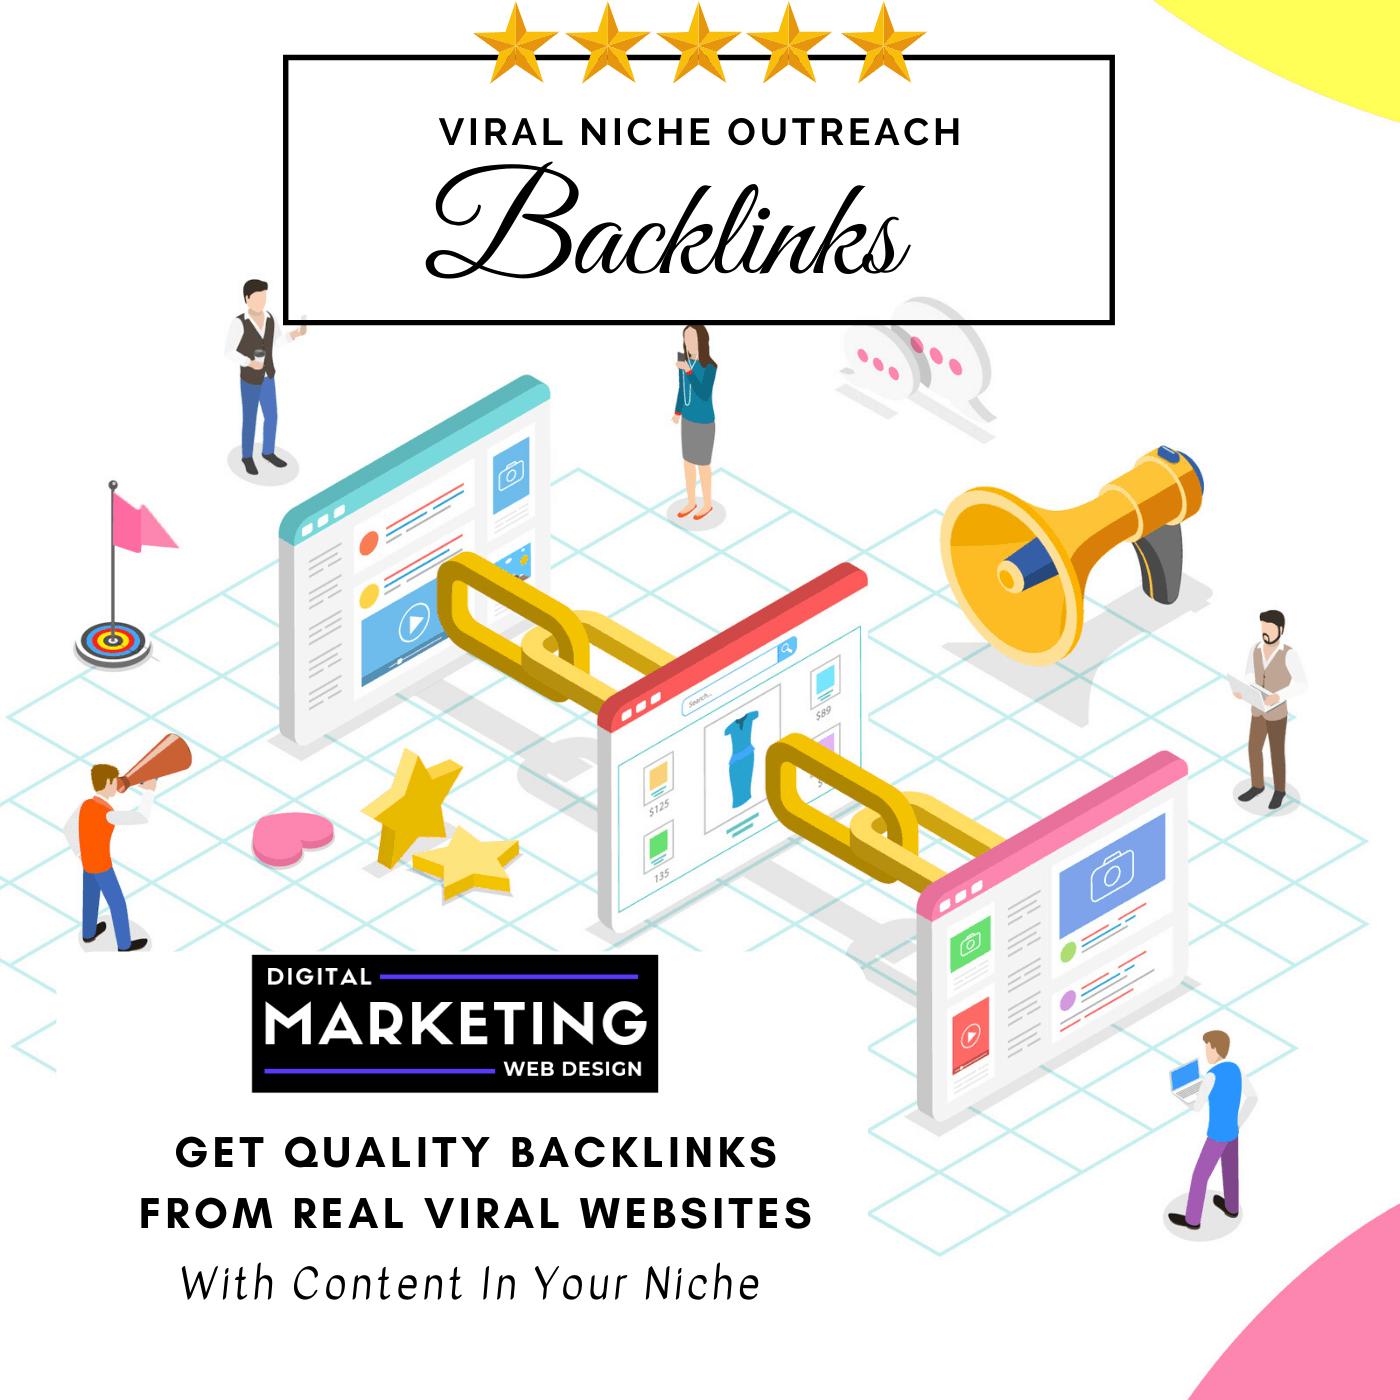 Buy Viral Niche Outreach Backlinks